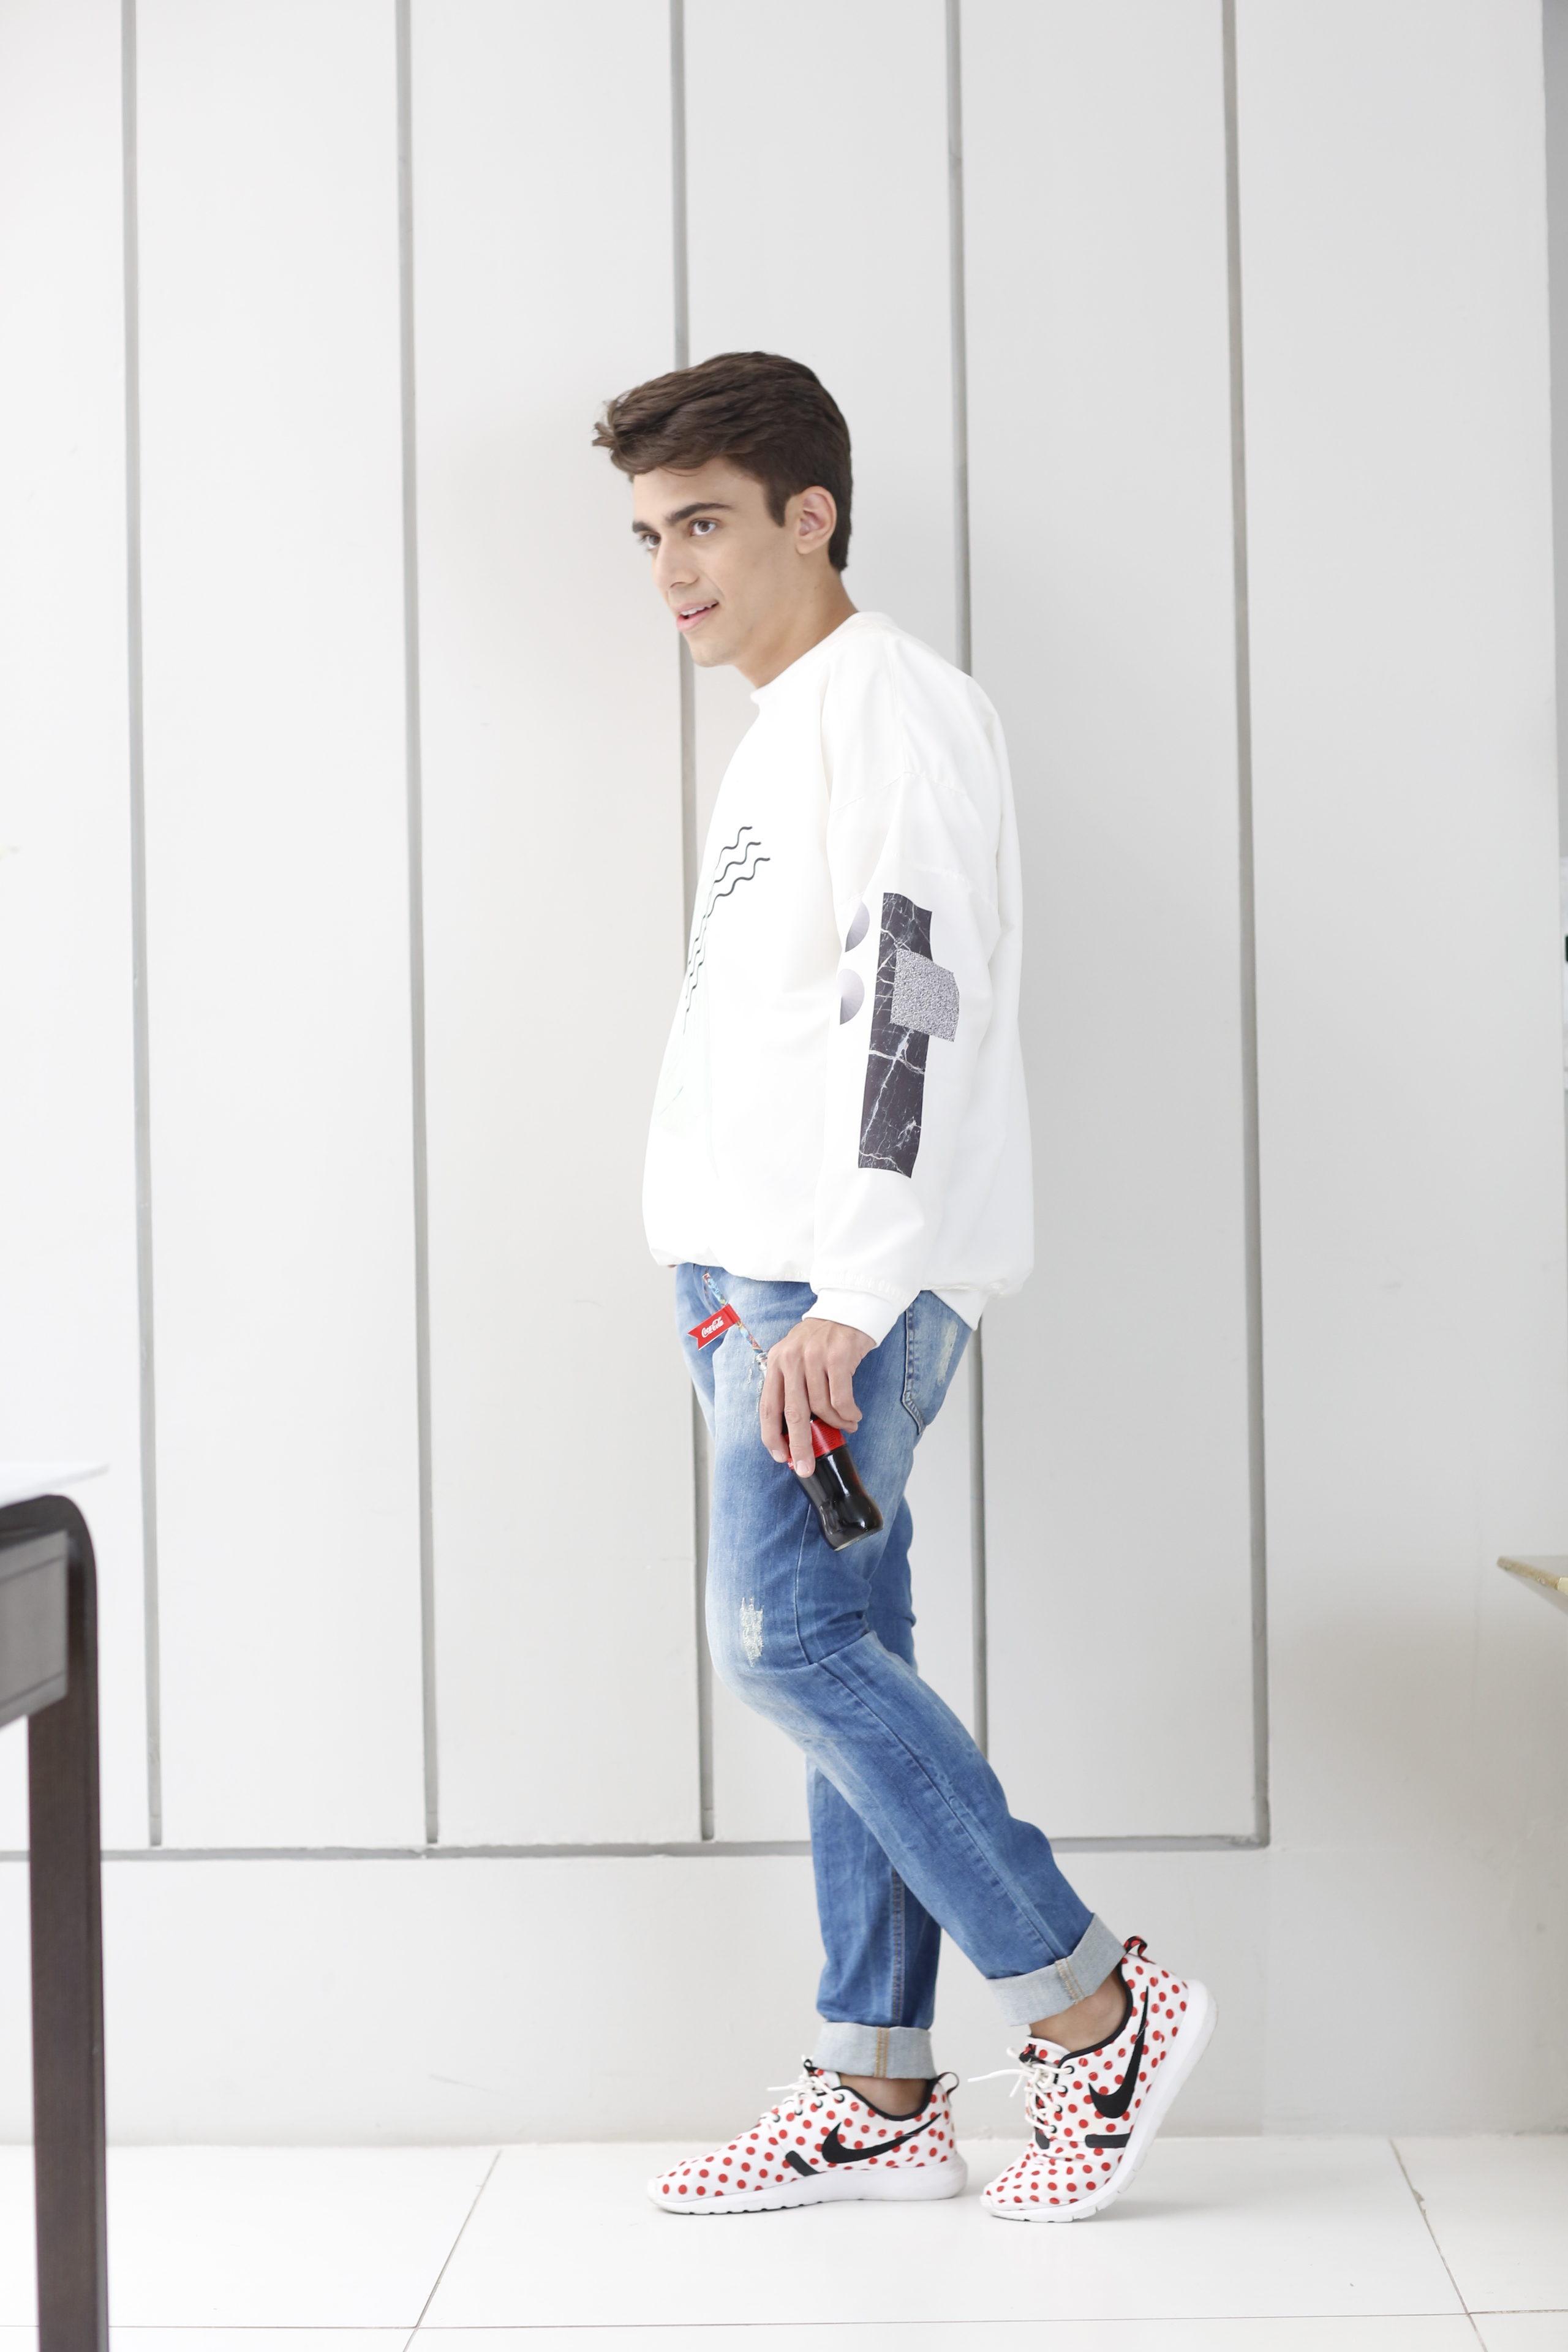 alex-cursino-youtuber-fhits-qg-fhits-spfw-spfwtransn42-moda-masculina-dicas-de-moda-dicas-de-estilo-como-ser-estiloso-youtuber-de-moda-mulher-do-padra-staroup-jeans-coca-cola-jeans-2